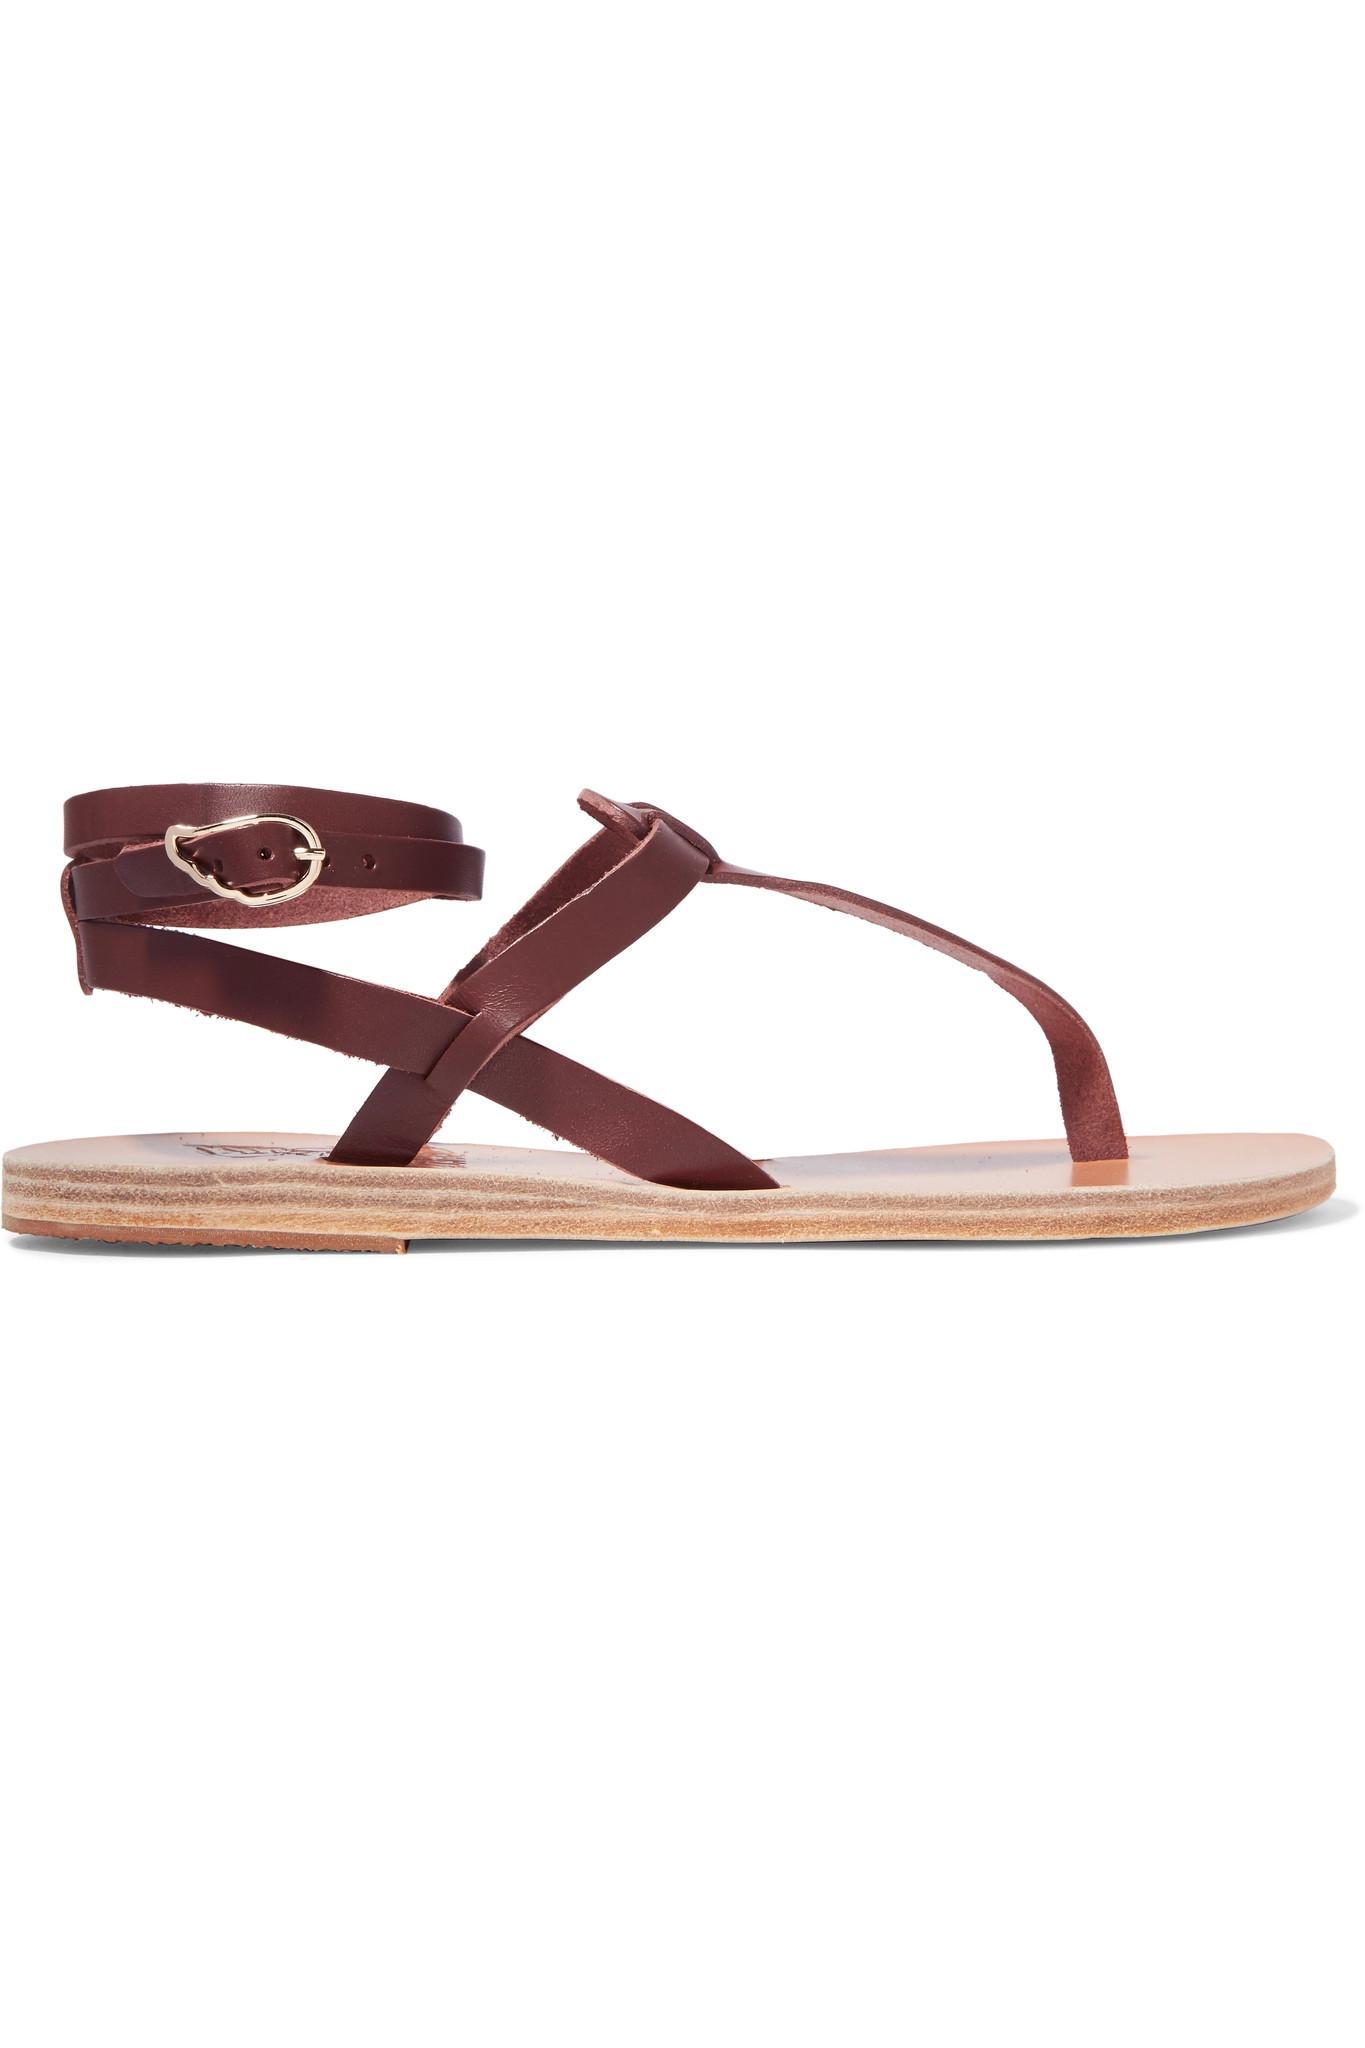 6c0ba6e623fe13 Lyst - Ancient Greek Sandals Estia Leather Sandals in Brown